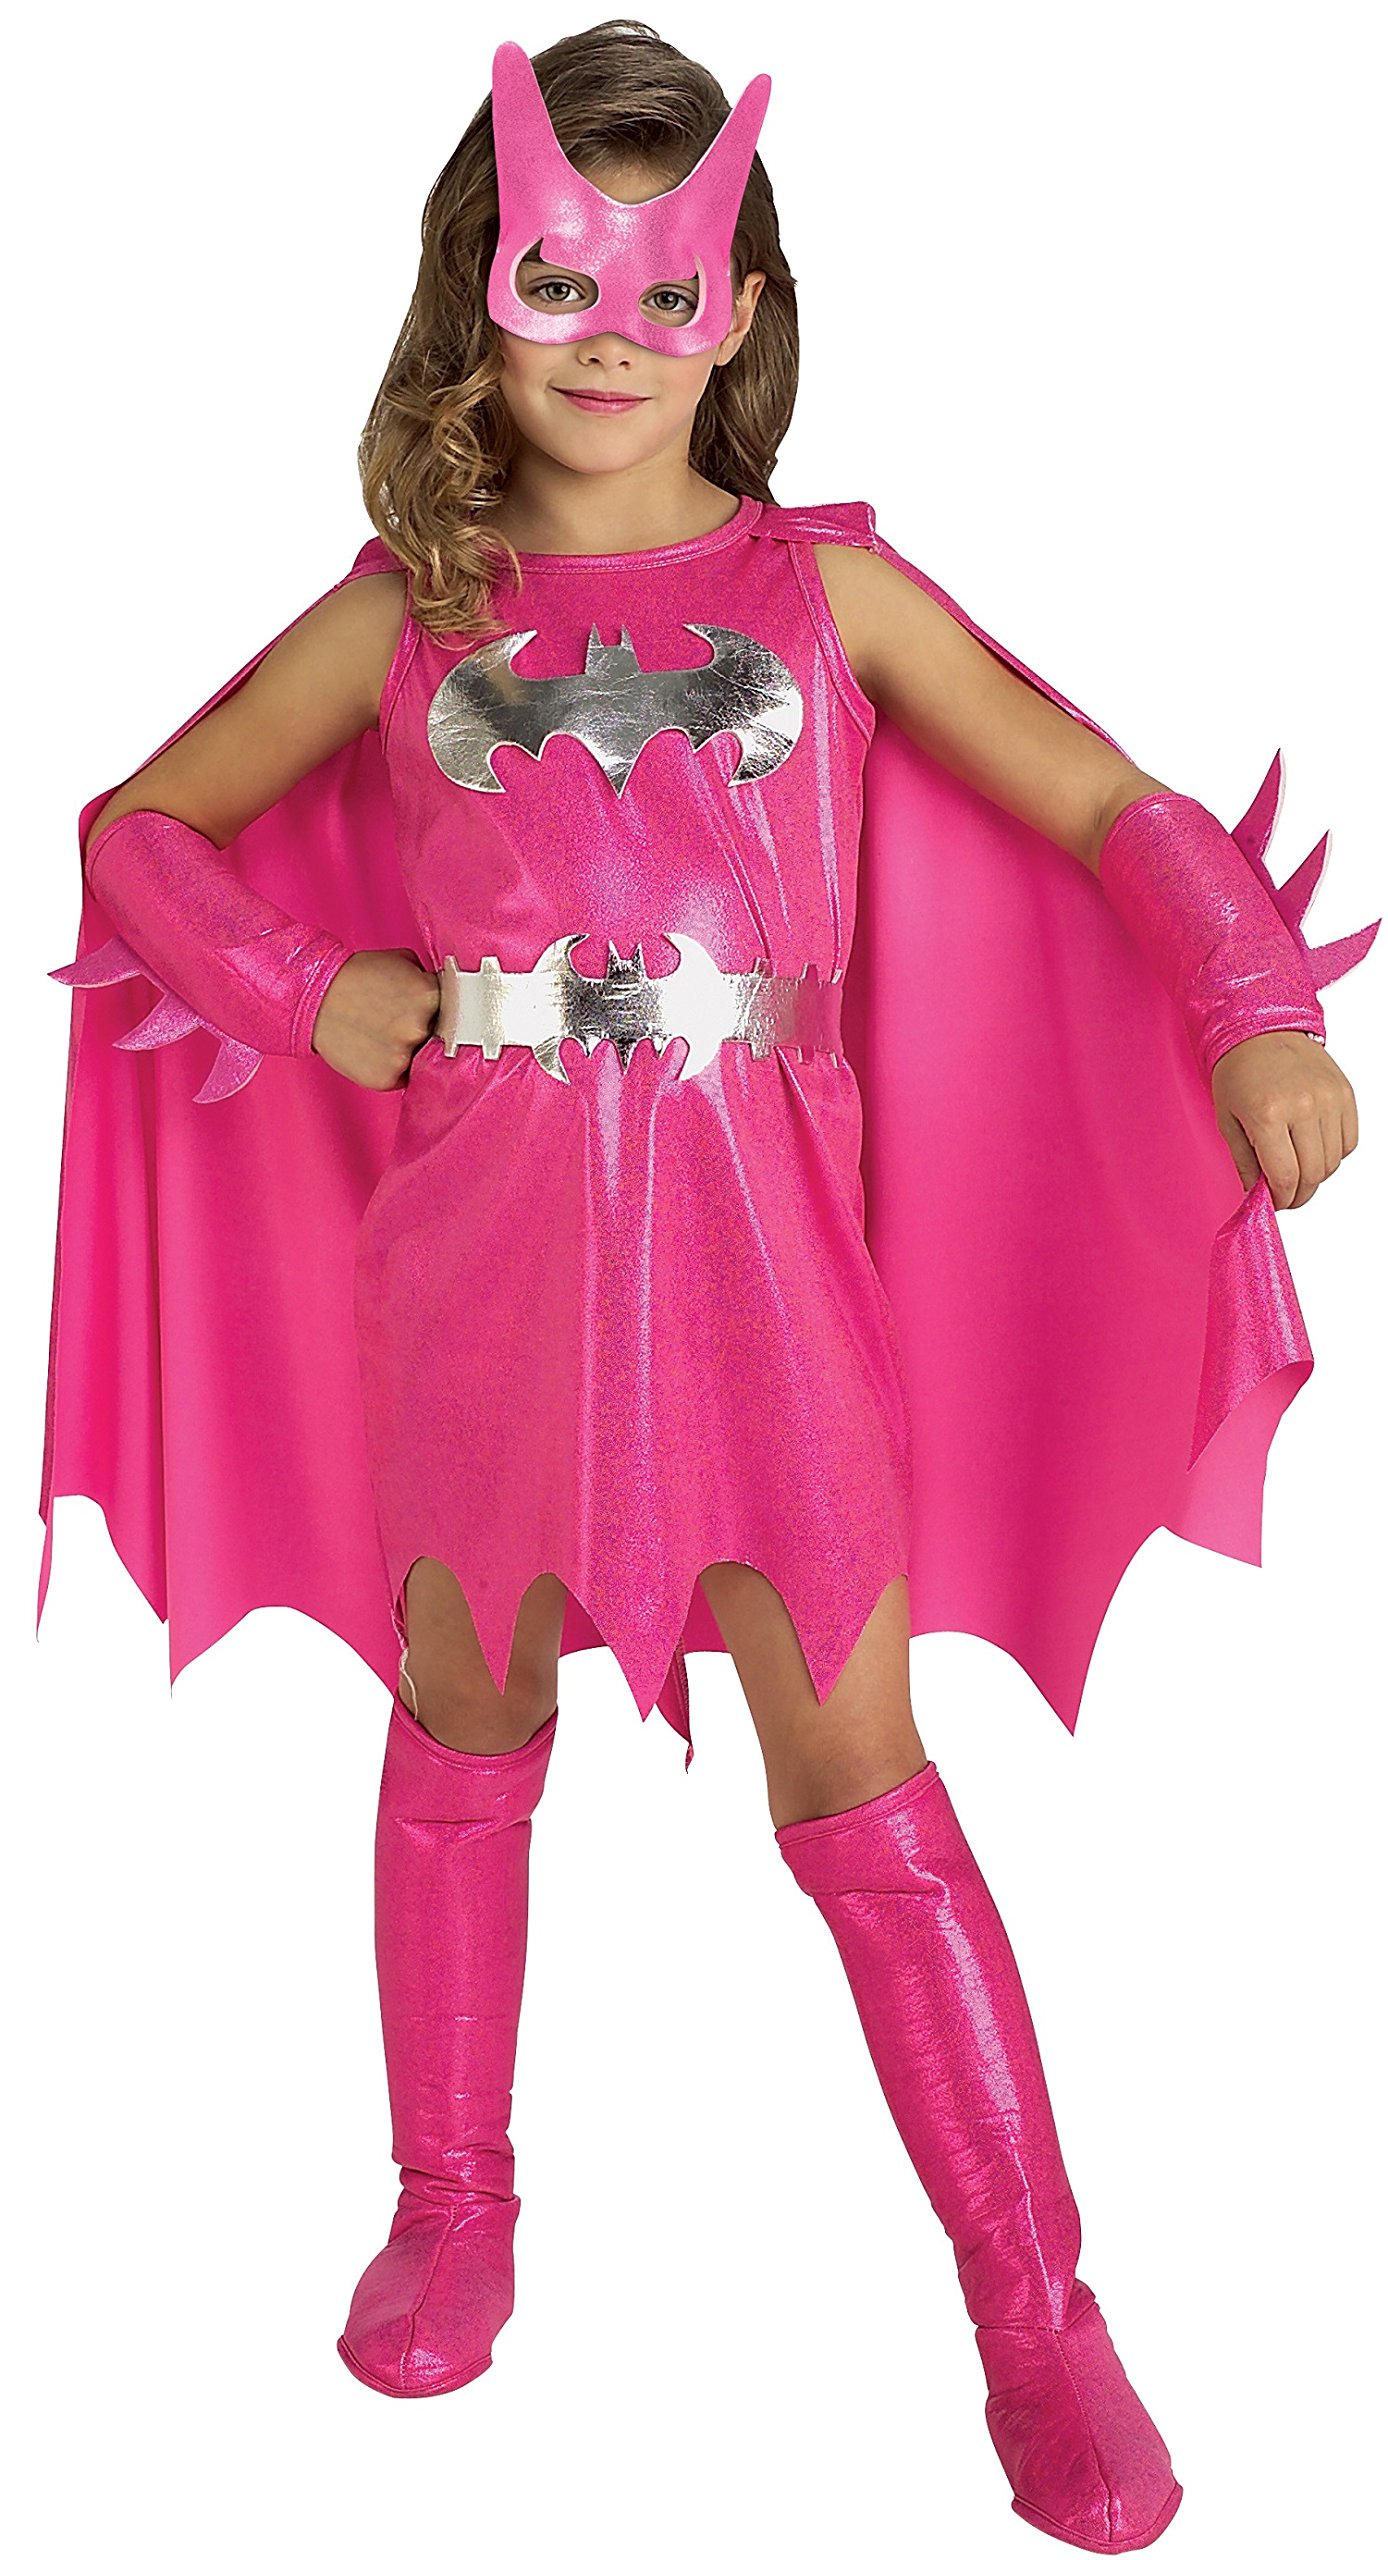 Rubieu0027s Official Pink Batgirl Girls Superhero Costume  sc 1 st  Amazon UK & Superhero Costume: Amazon.co.uk